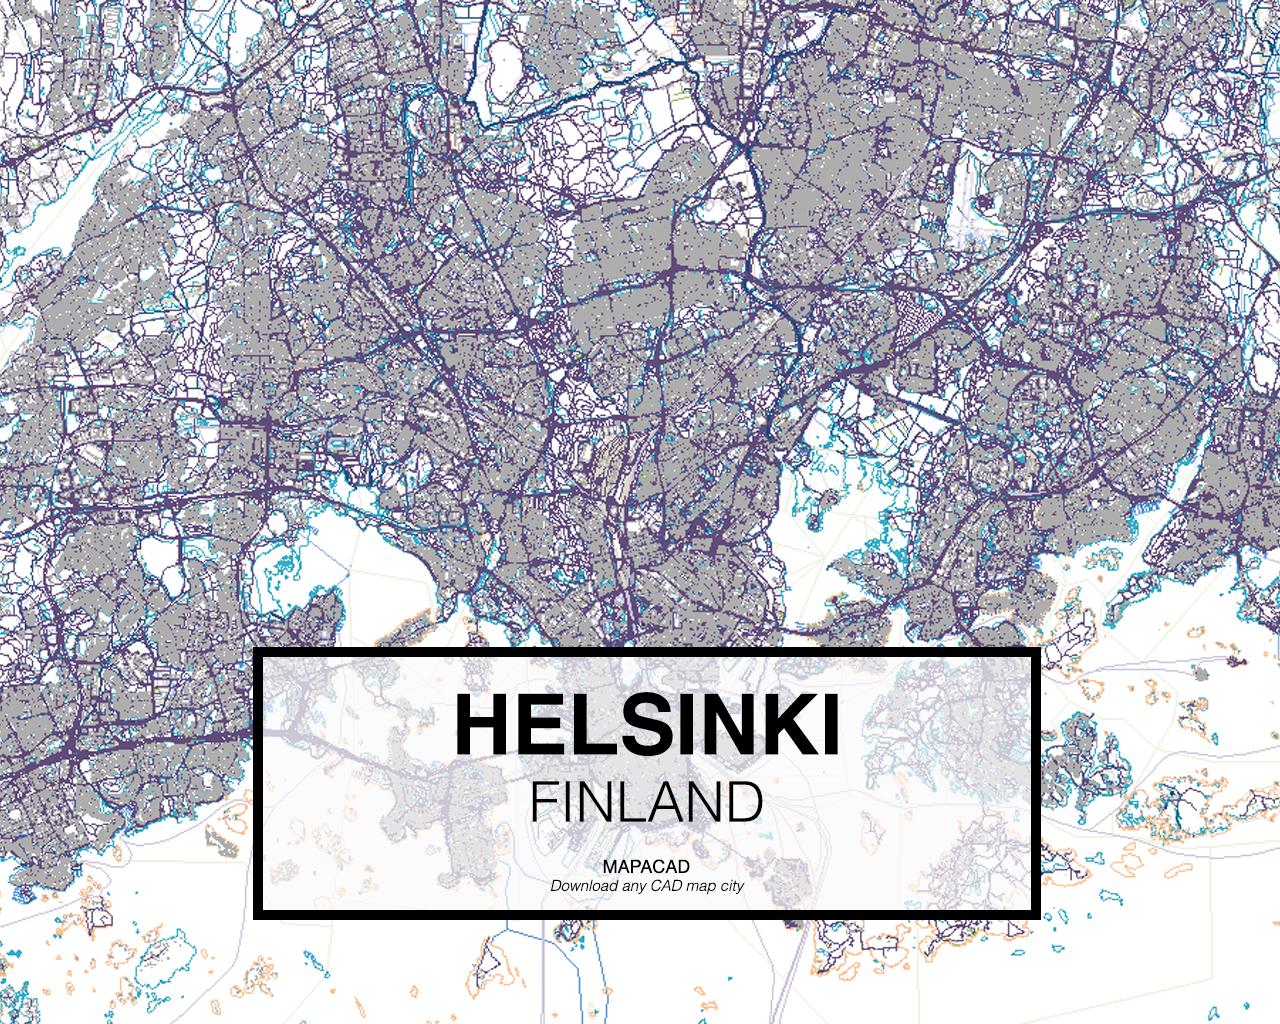 Download helsinki dwg mapacad helsinki finland 01 mapacad download map cad dwg gumiabroncs Image collections